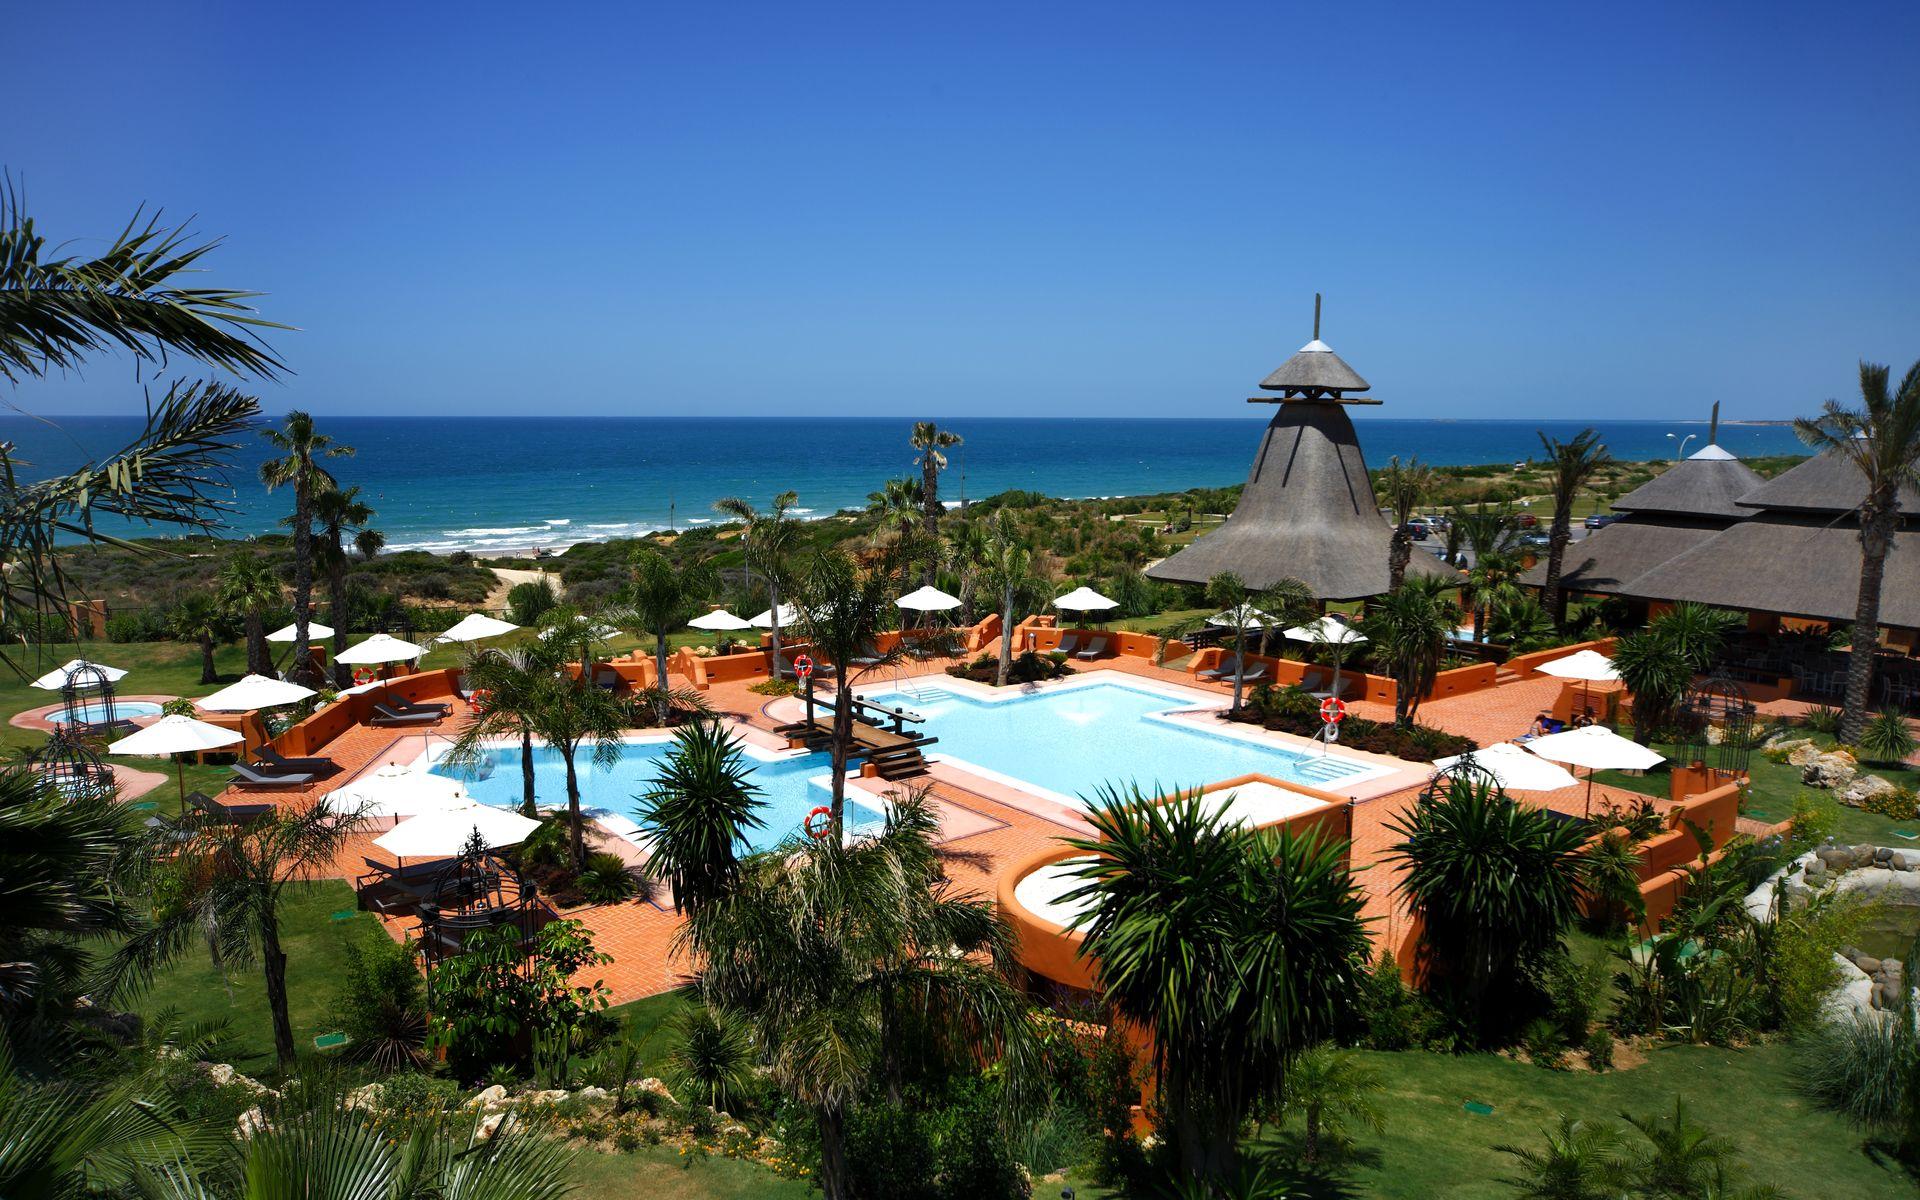 barcelo-sancti-petri-relax-en-cadiz-piscinas